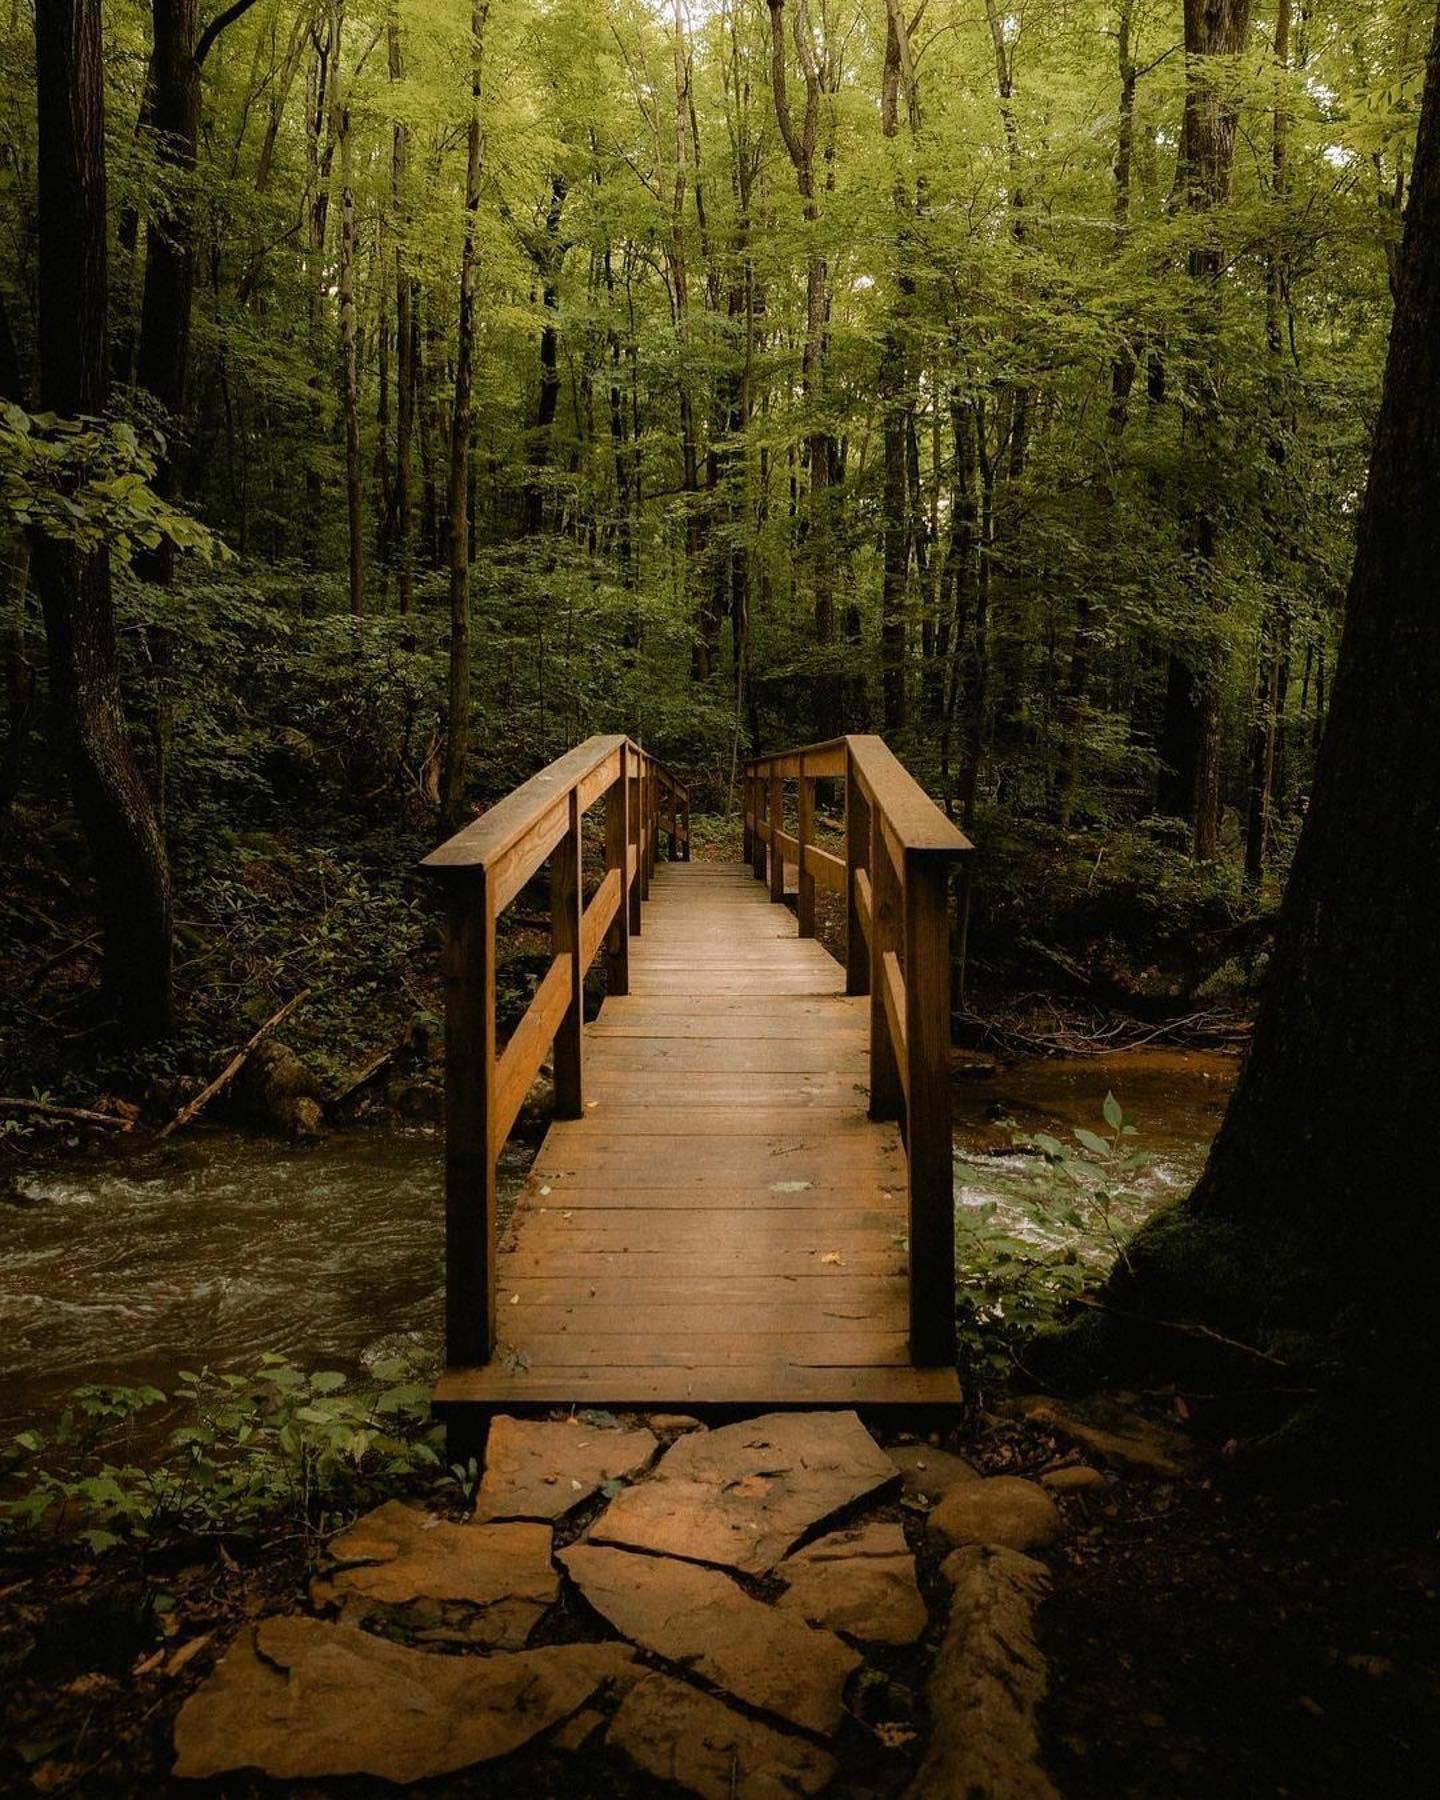 Jonathan Run Falls Trail via Kentuck Trail in Ohiopyle State Park